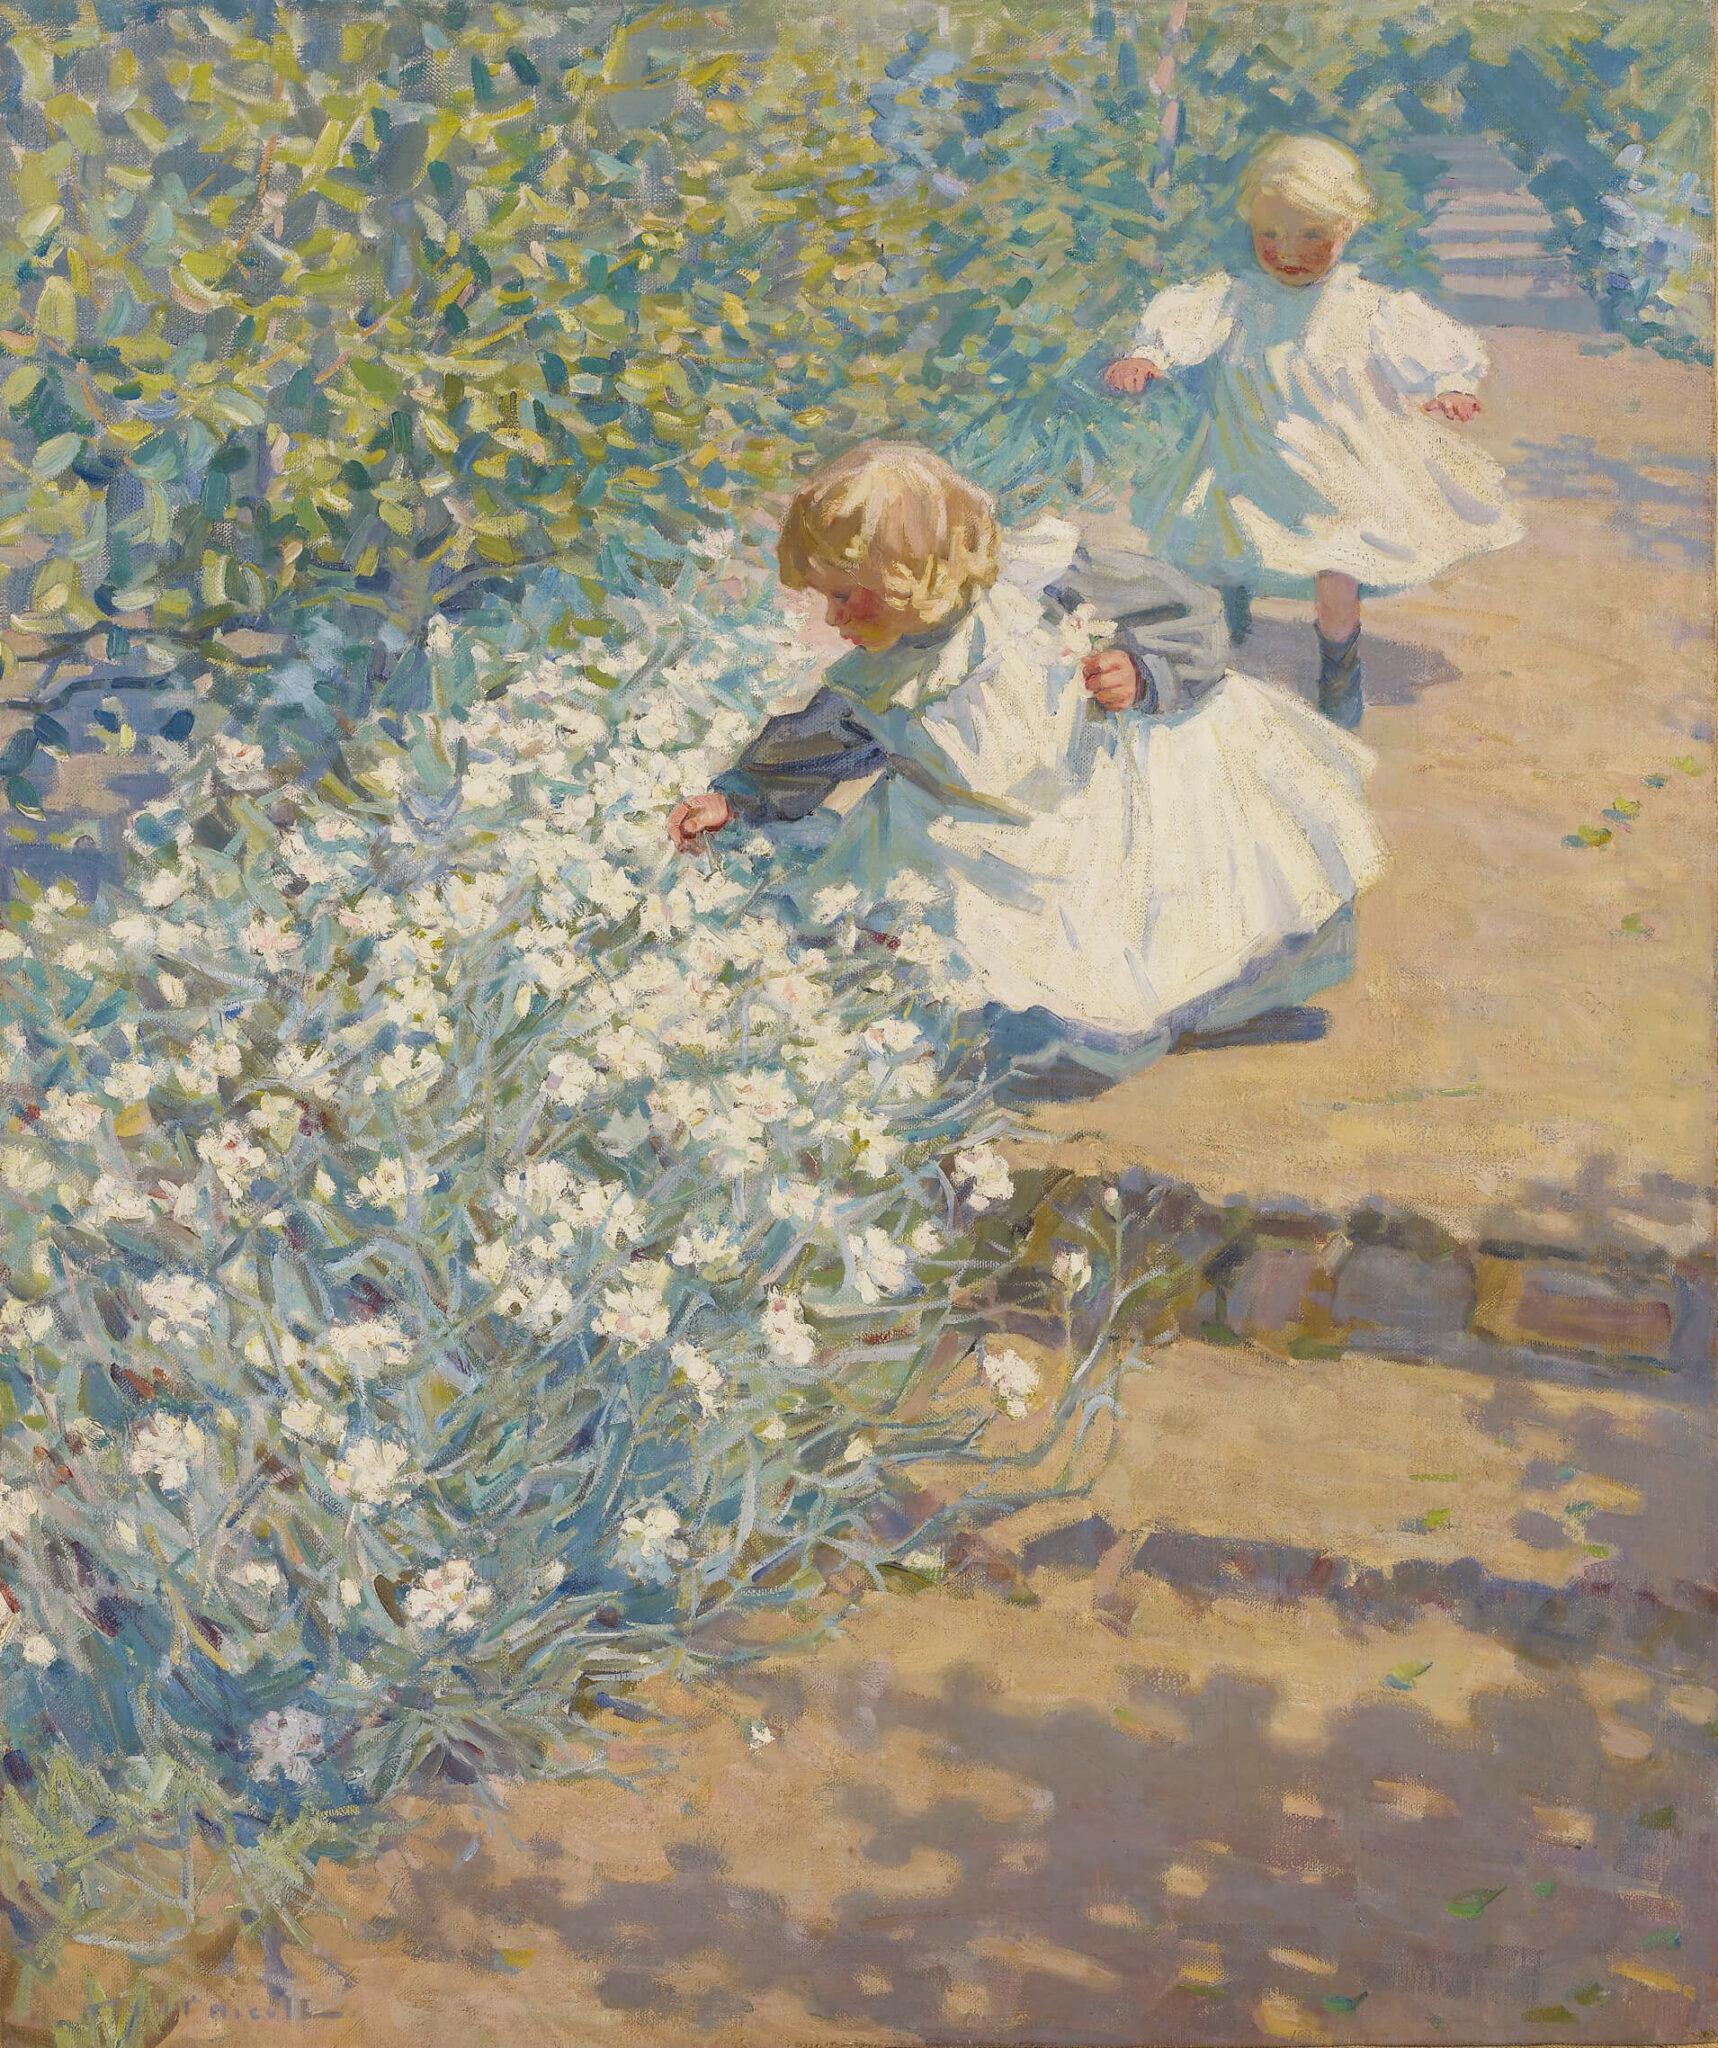 Helen McNicoll, Picking Flowers, c. 1912